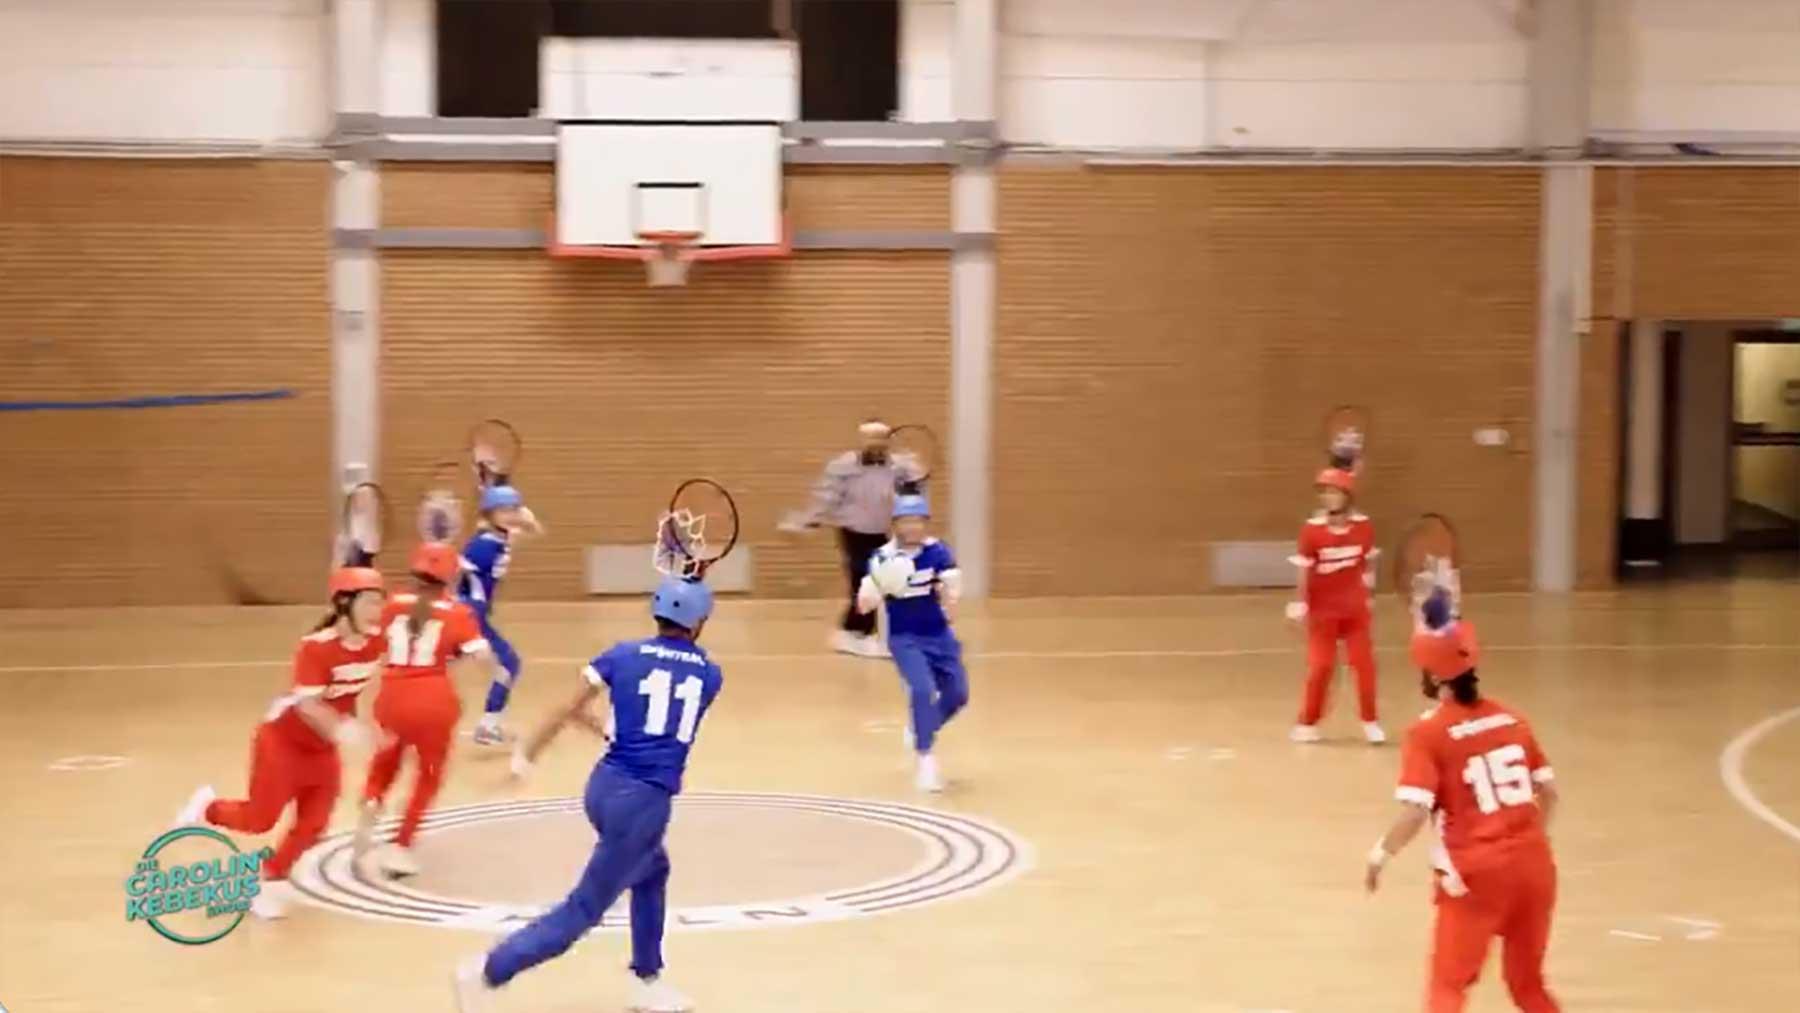 """Sportball"" ist die bescheuertste Sportall aller Zeiten"